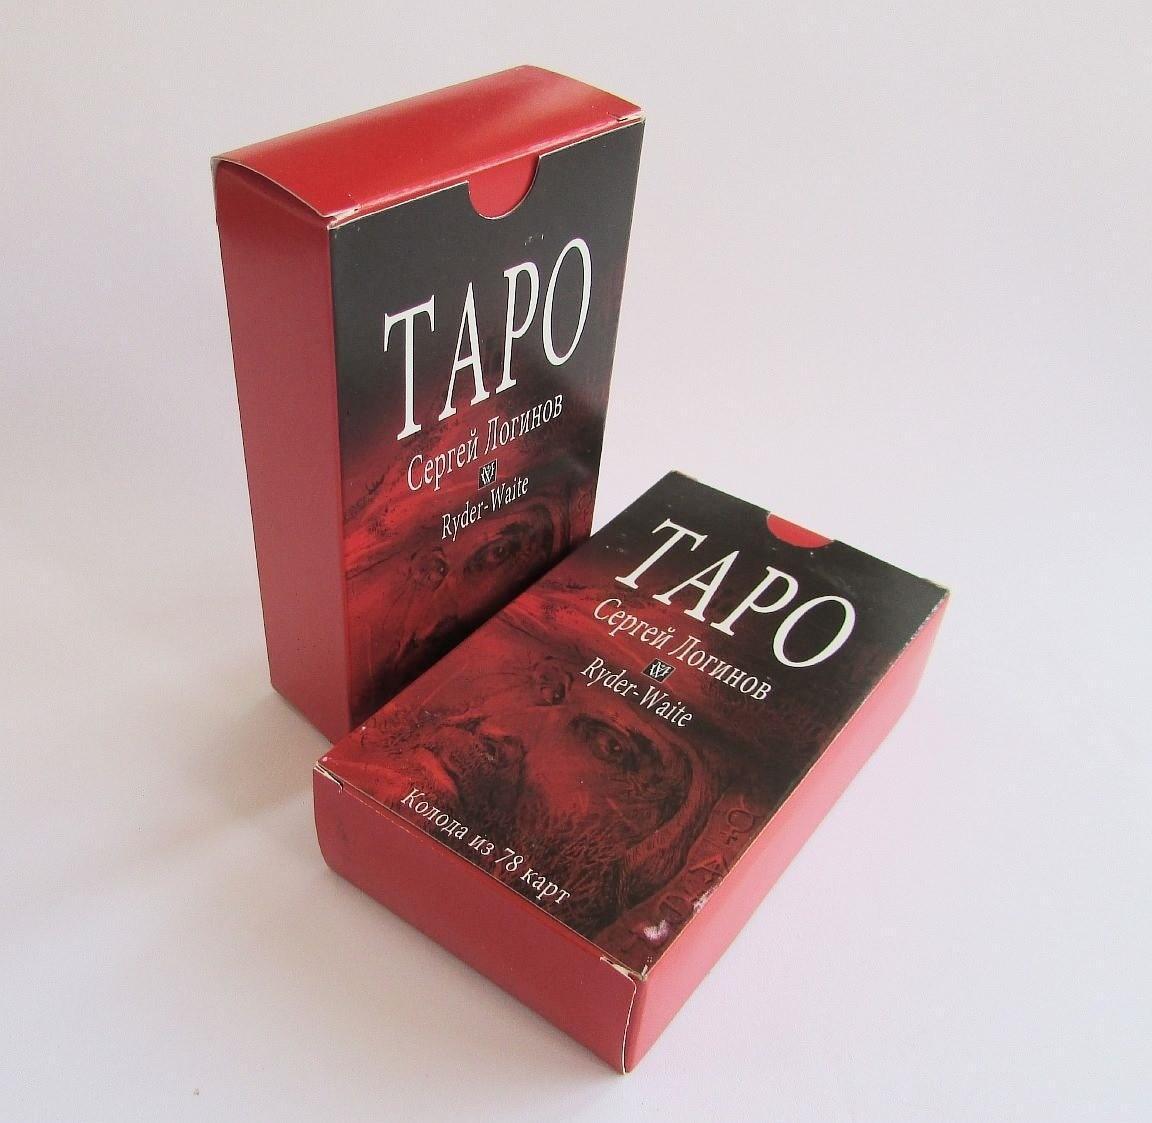 Таро Логинова купить в Украине